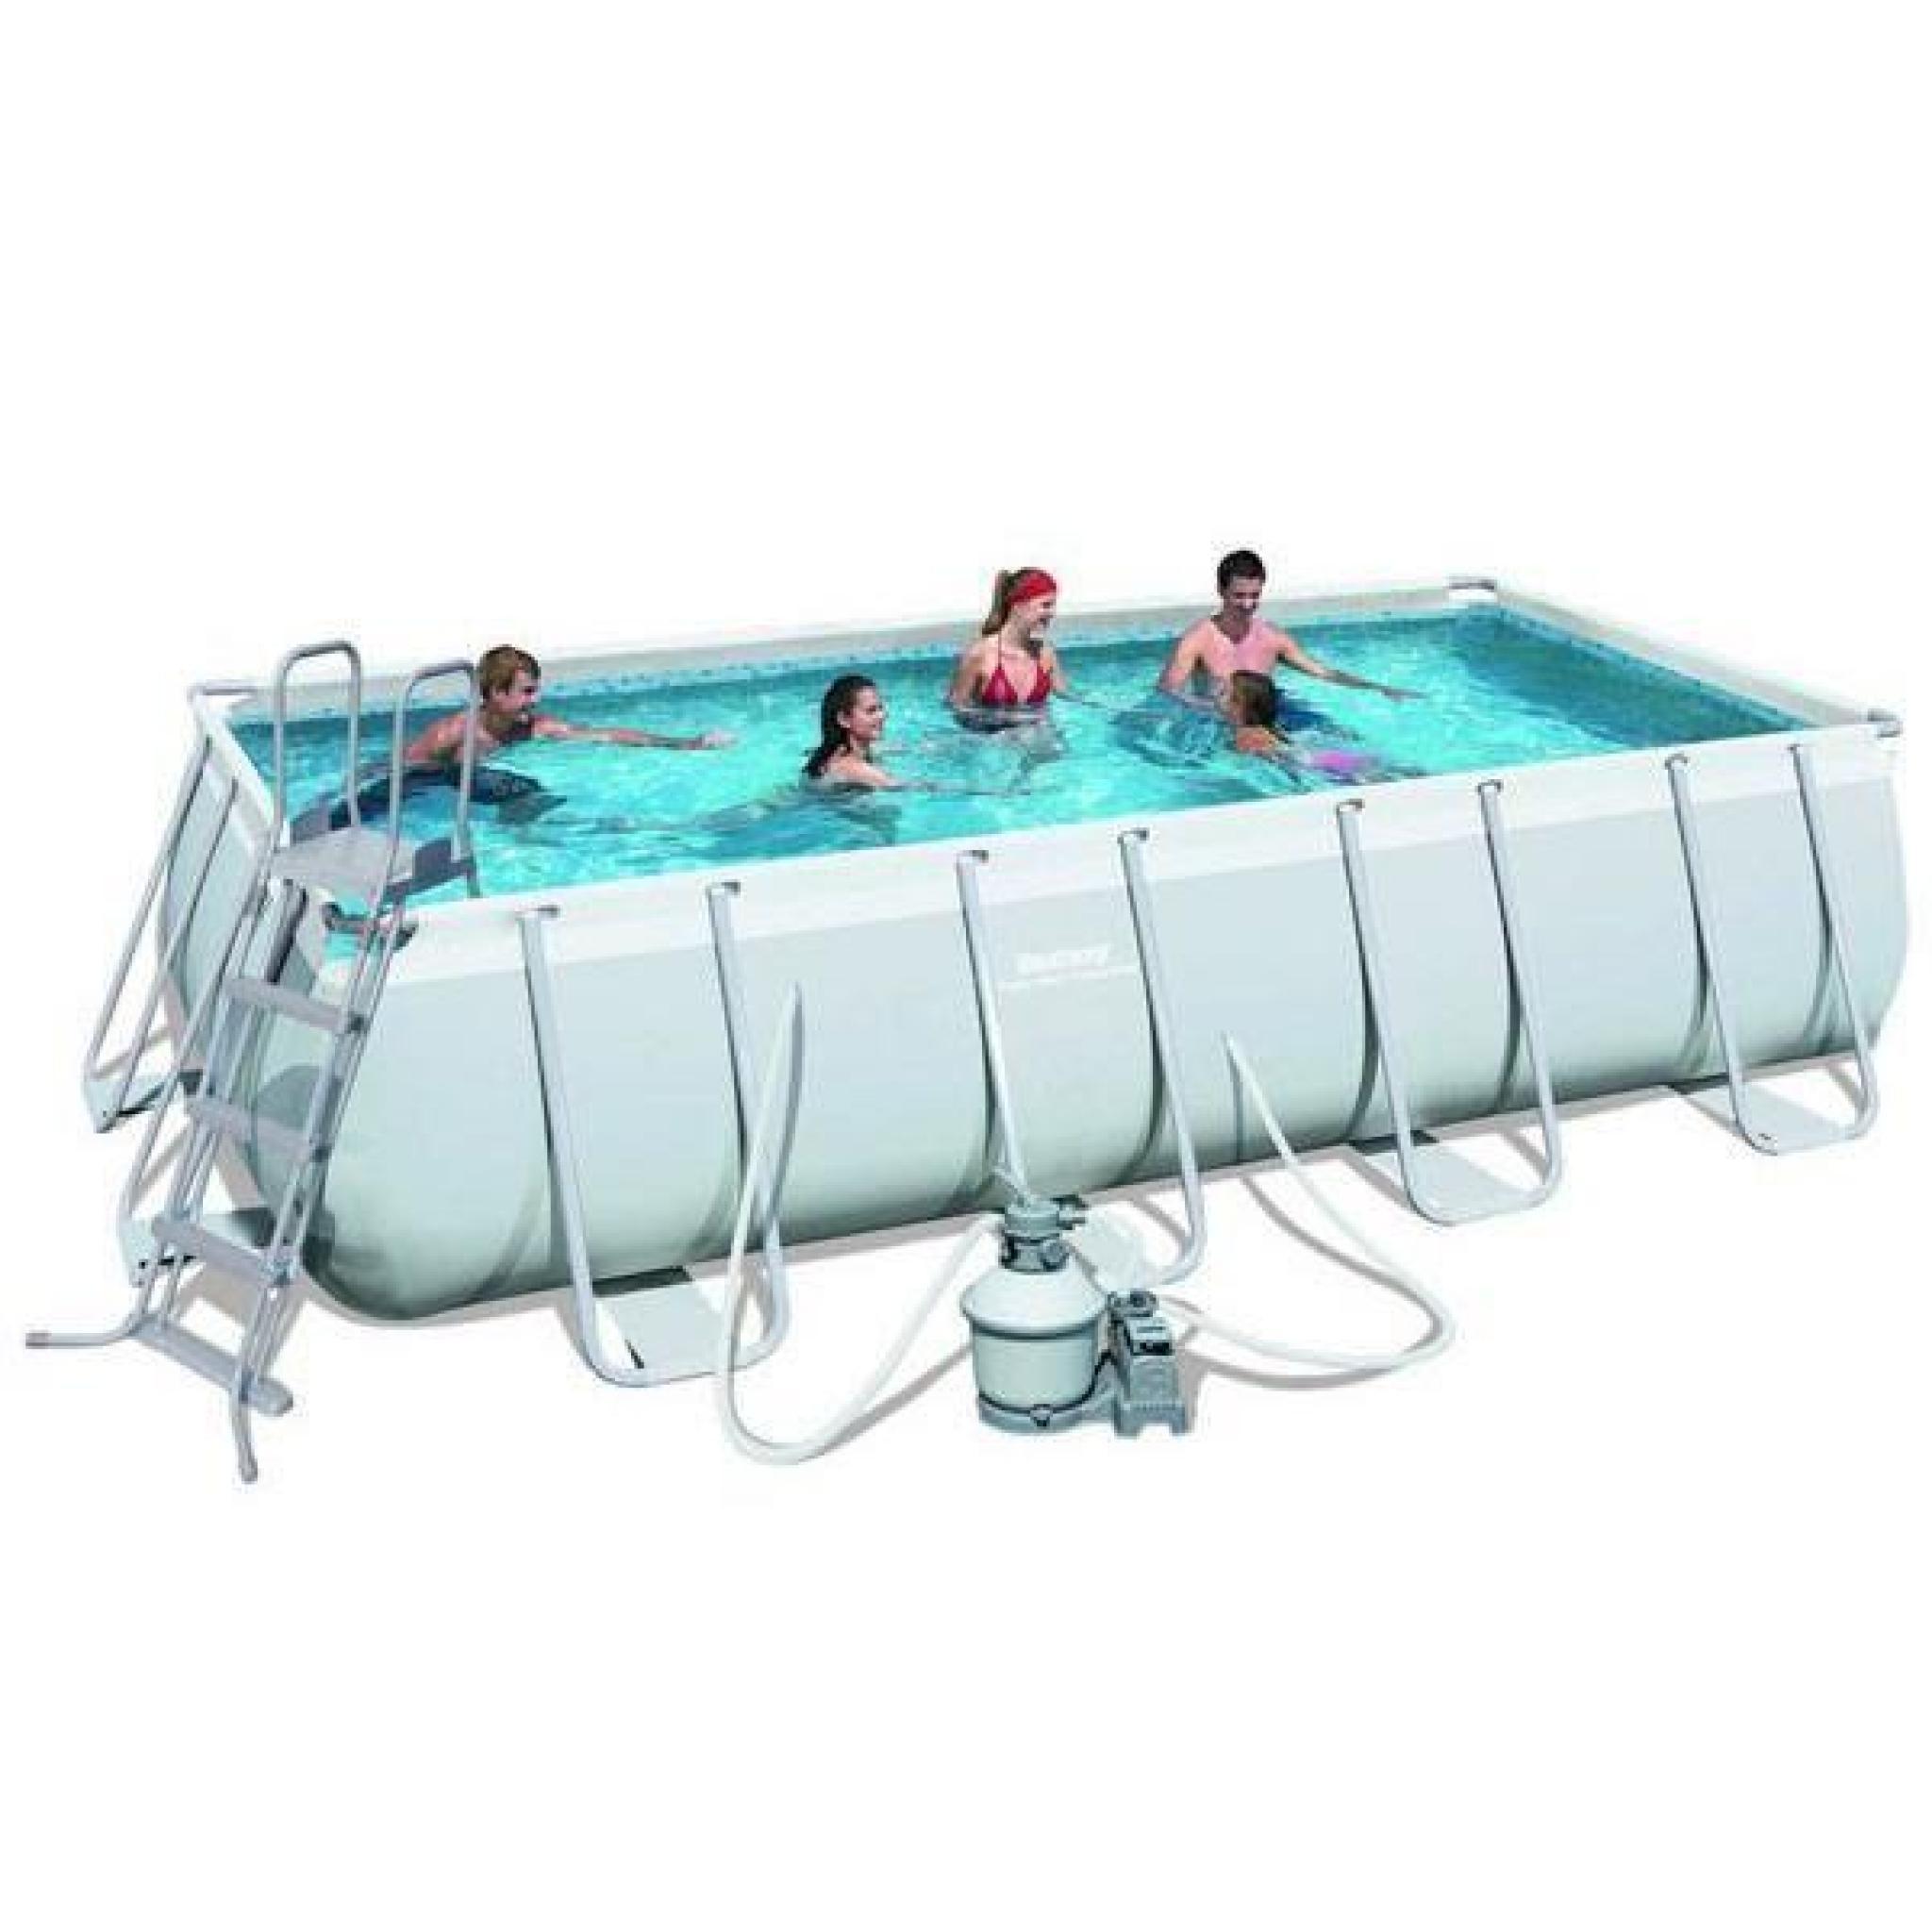 piscine tubulaire rectangulaire bestway 4 88 x 2 74 x 1 22. Black Bedroom Furniture Sets. Home Design Ideas